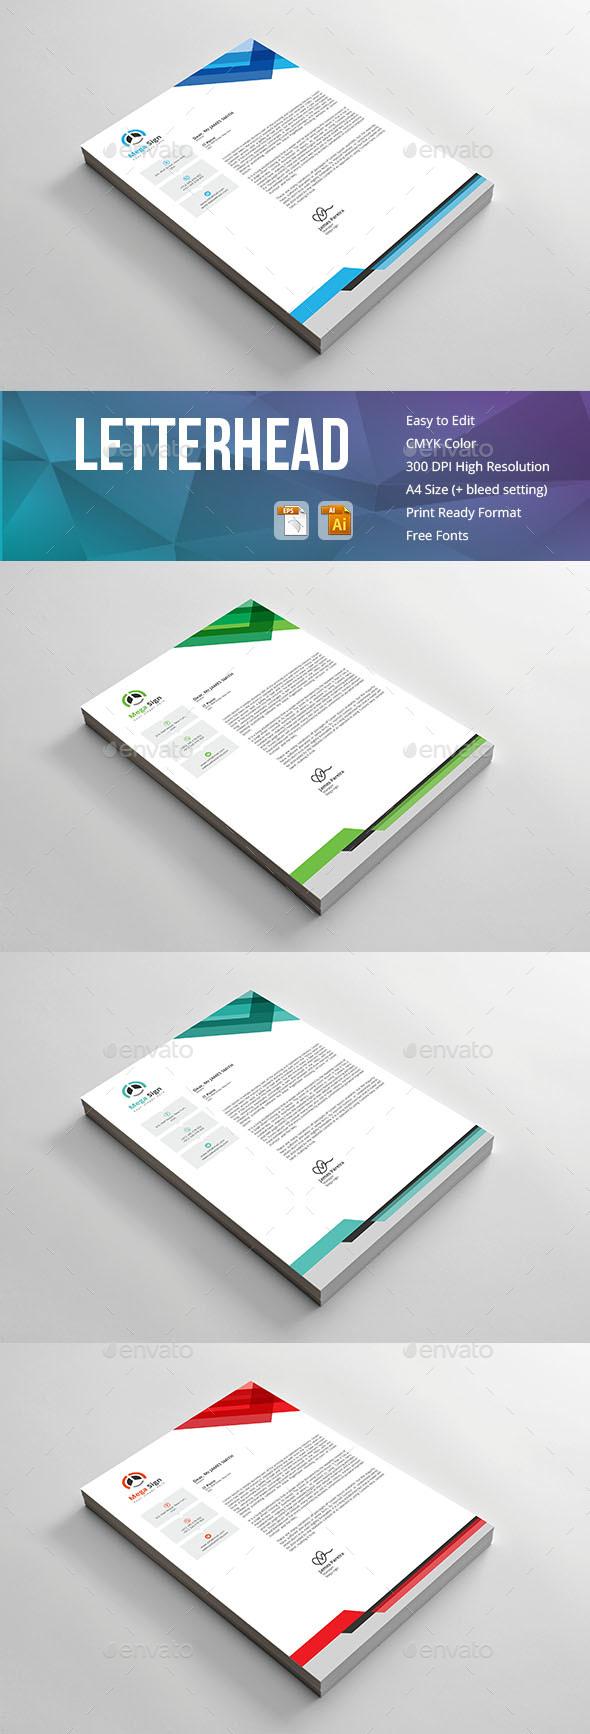 Letterhead - Print Templates